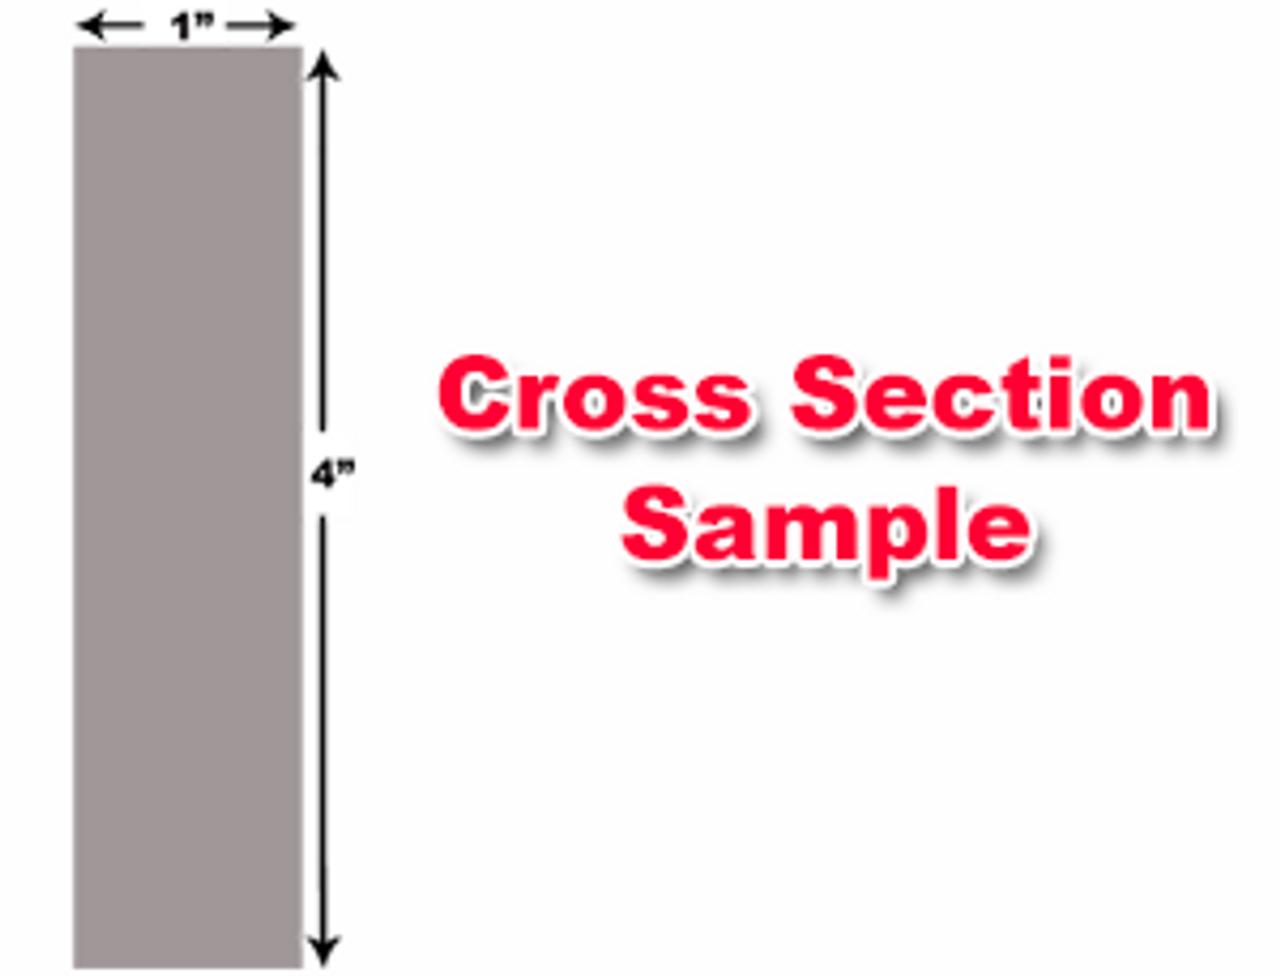 "Lodge & Shipley Shear Knives - 148"" Length, 4"" x 1"" Cross Section (239128) Type B"